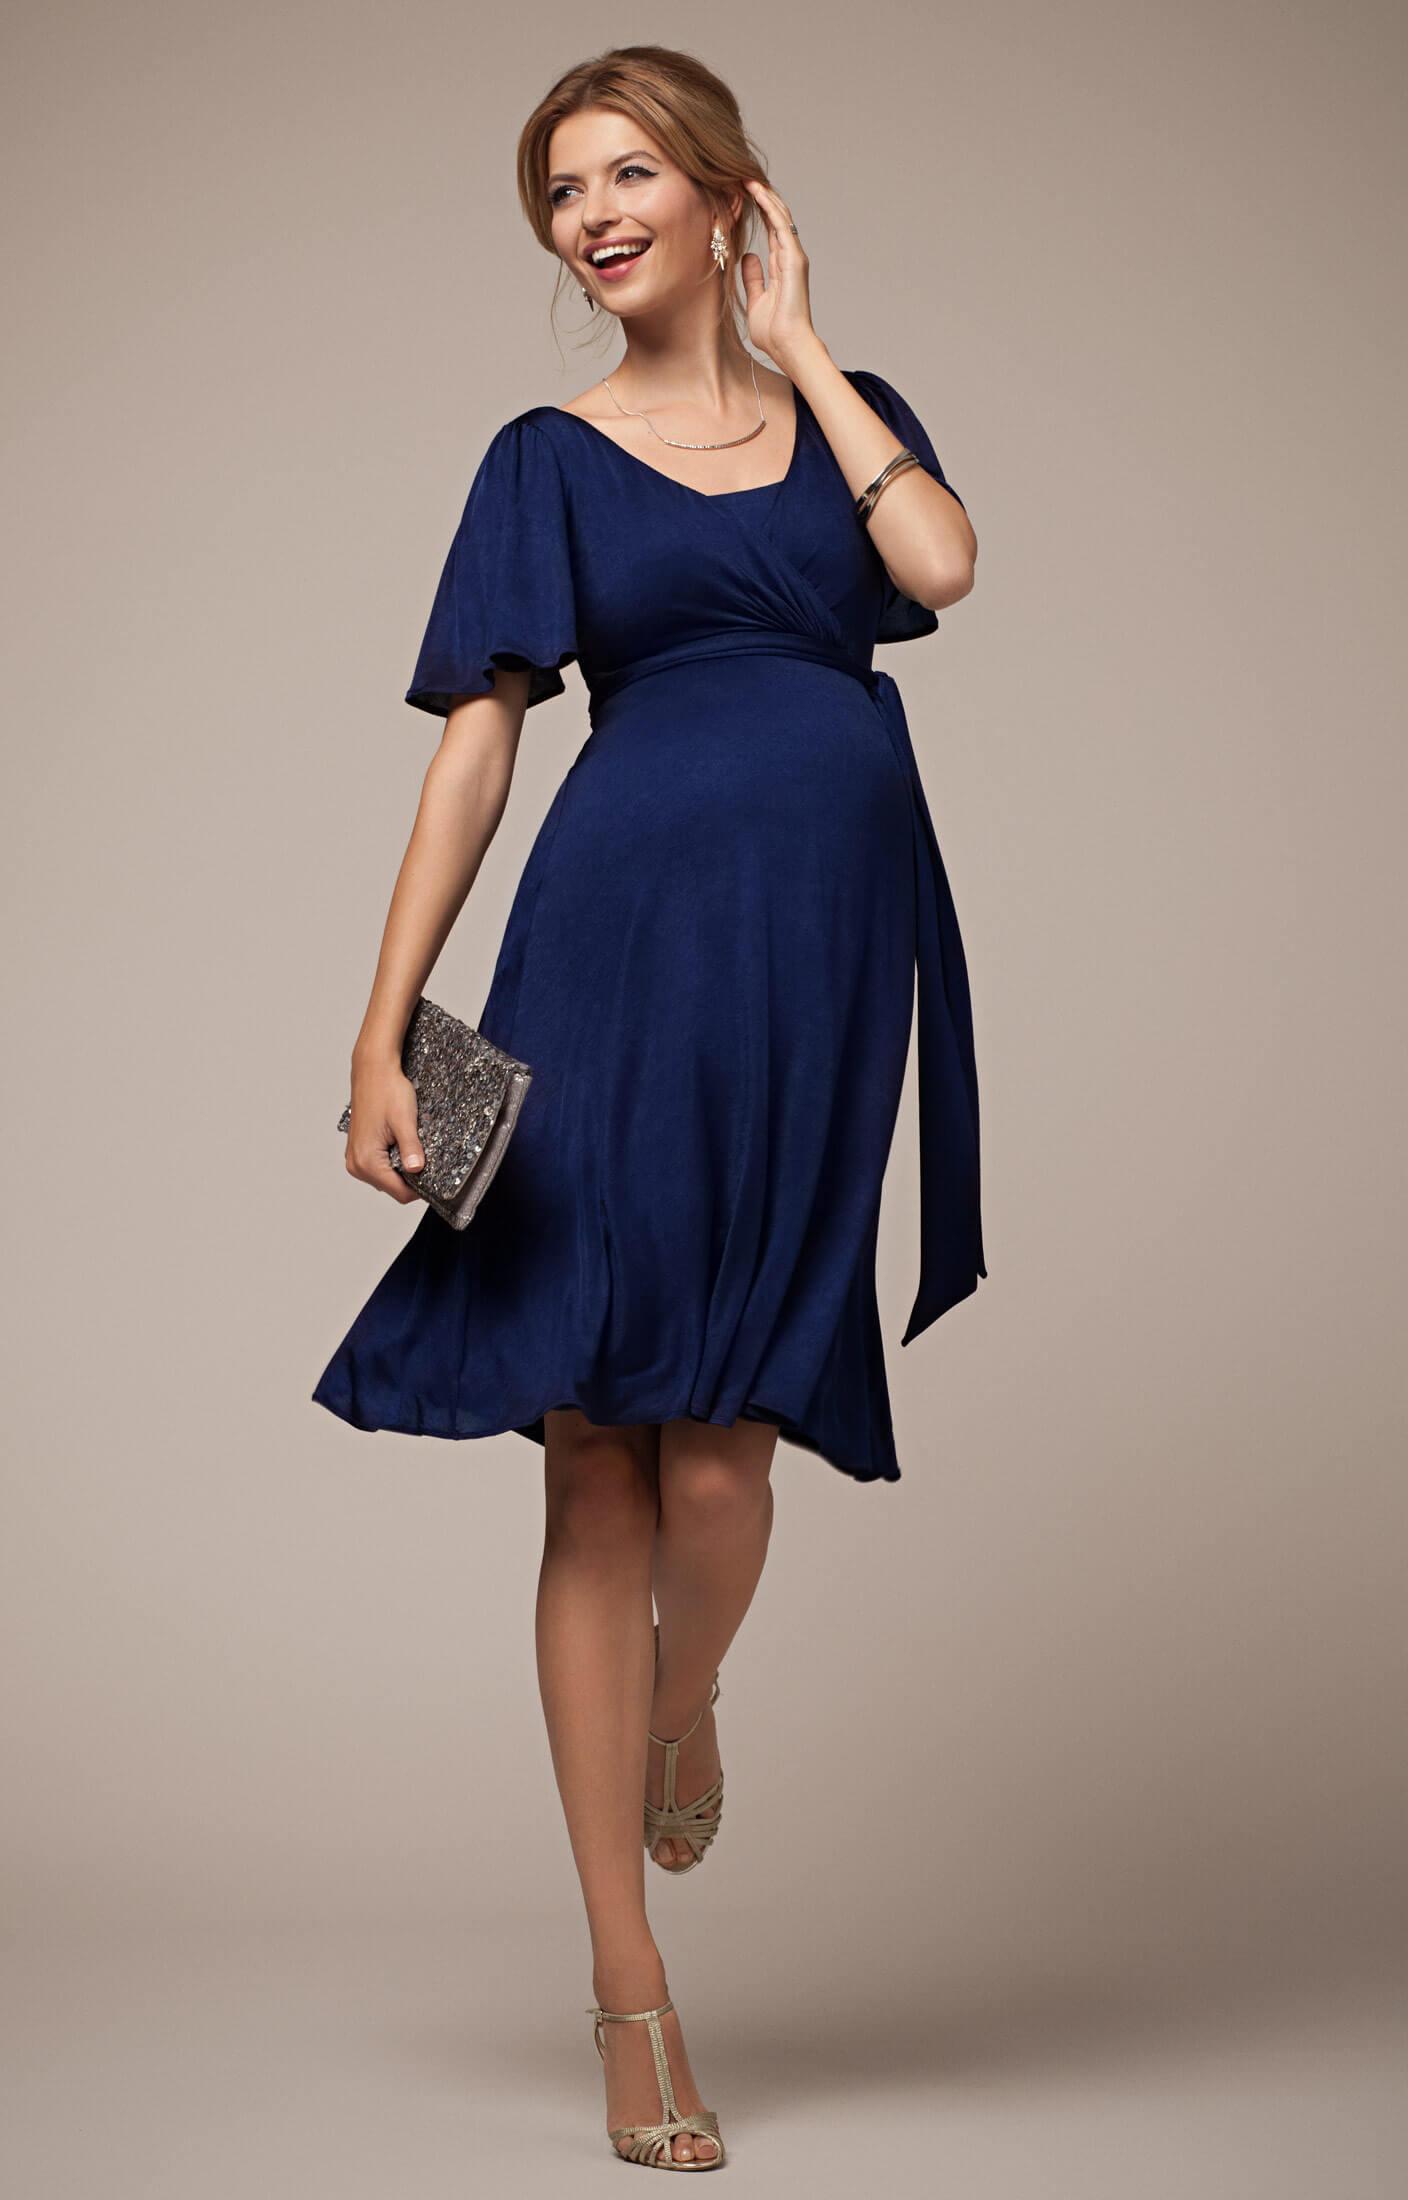 Alicia Nursing Dress Eclipse Blue - Maternity Wedding Dresses ...